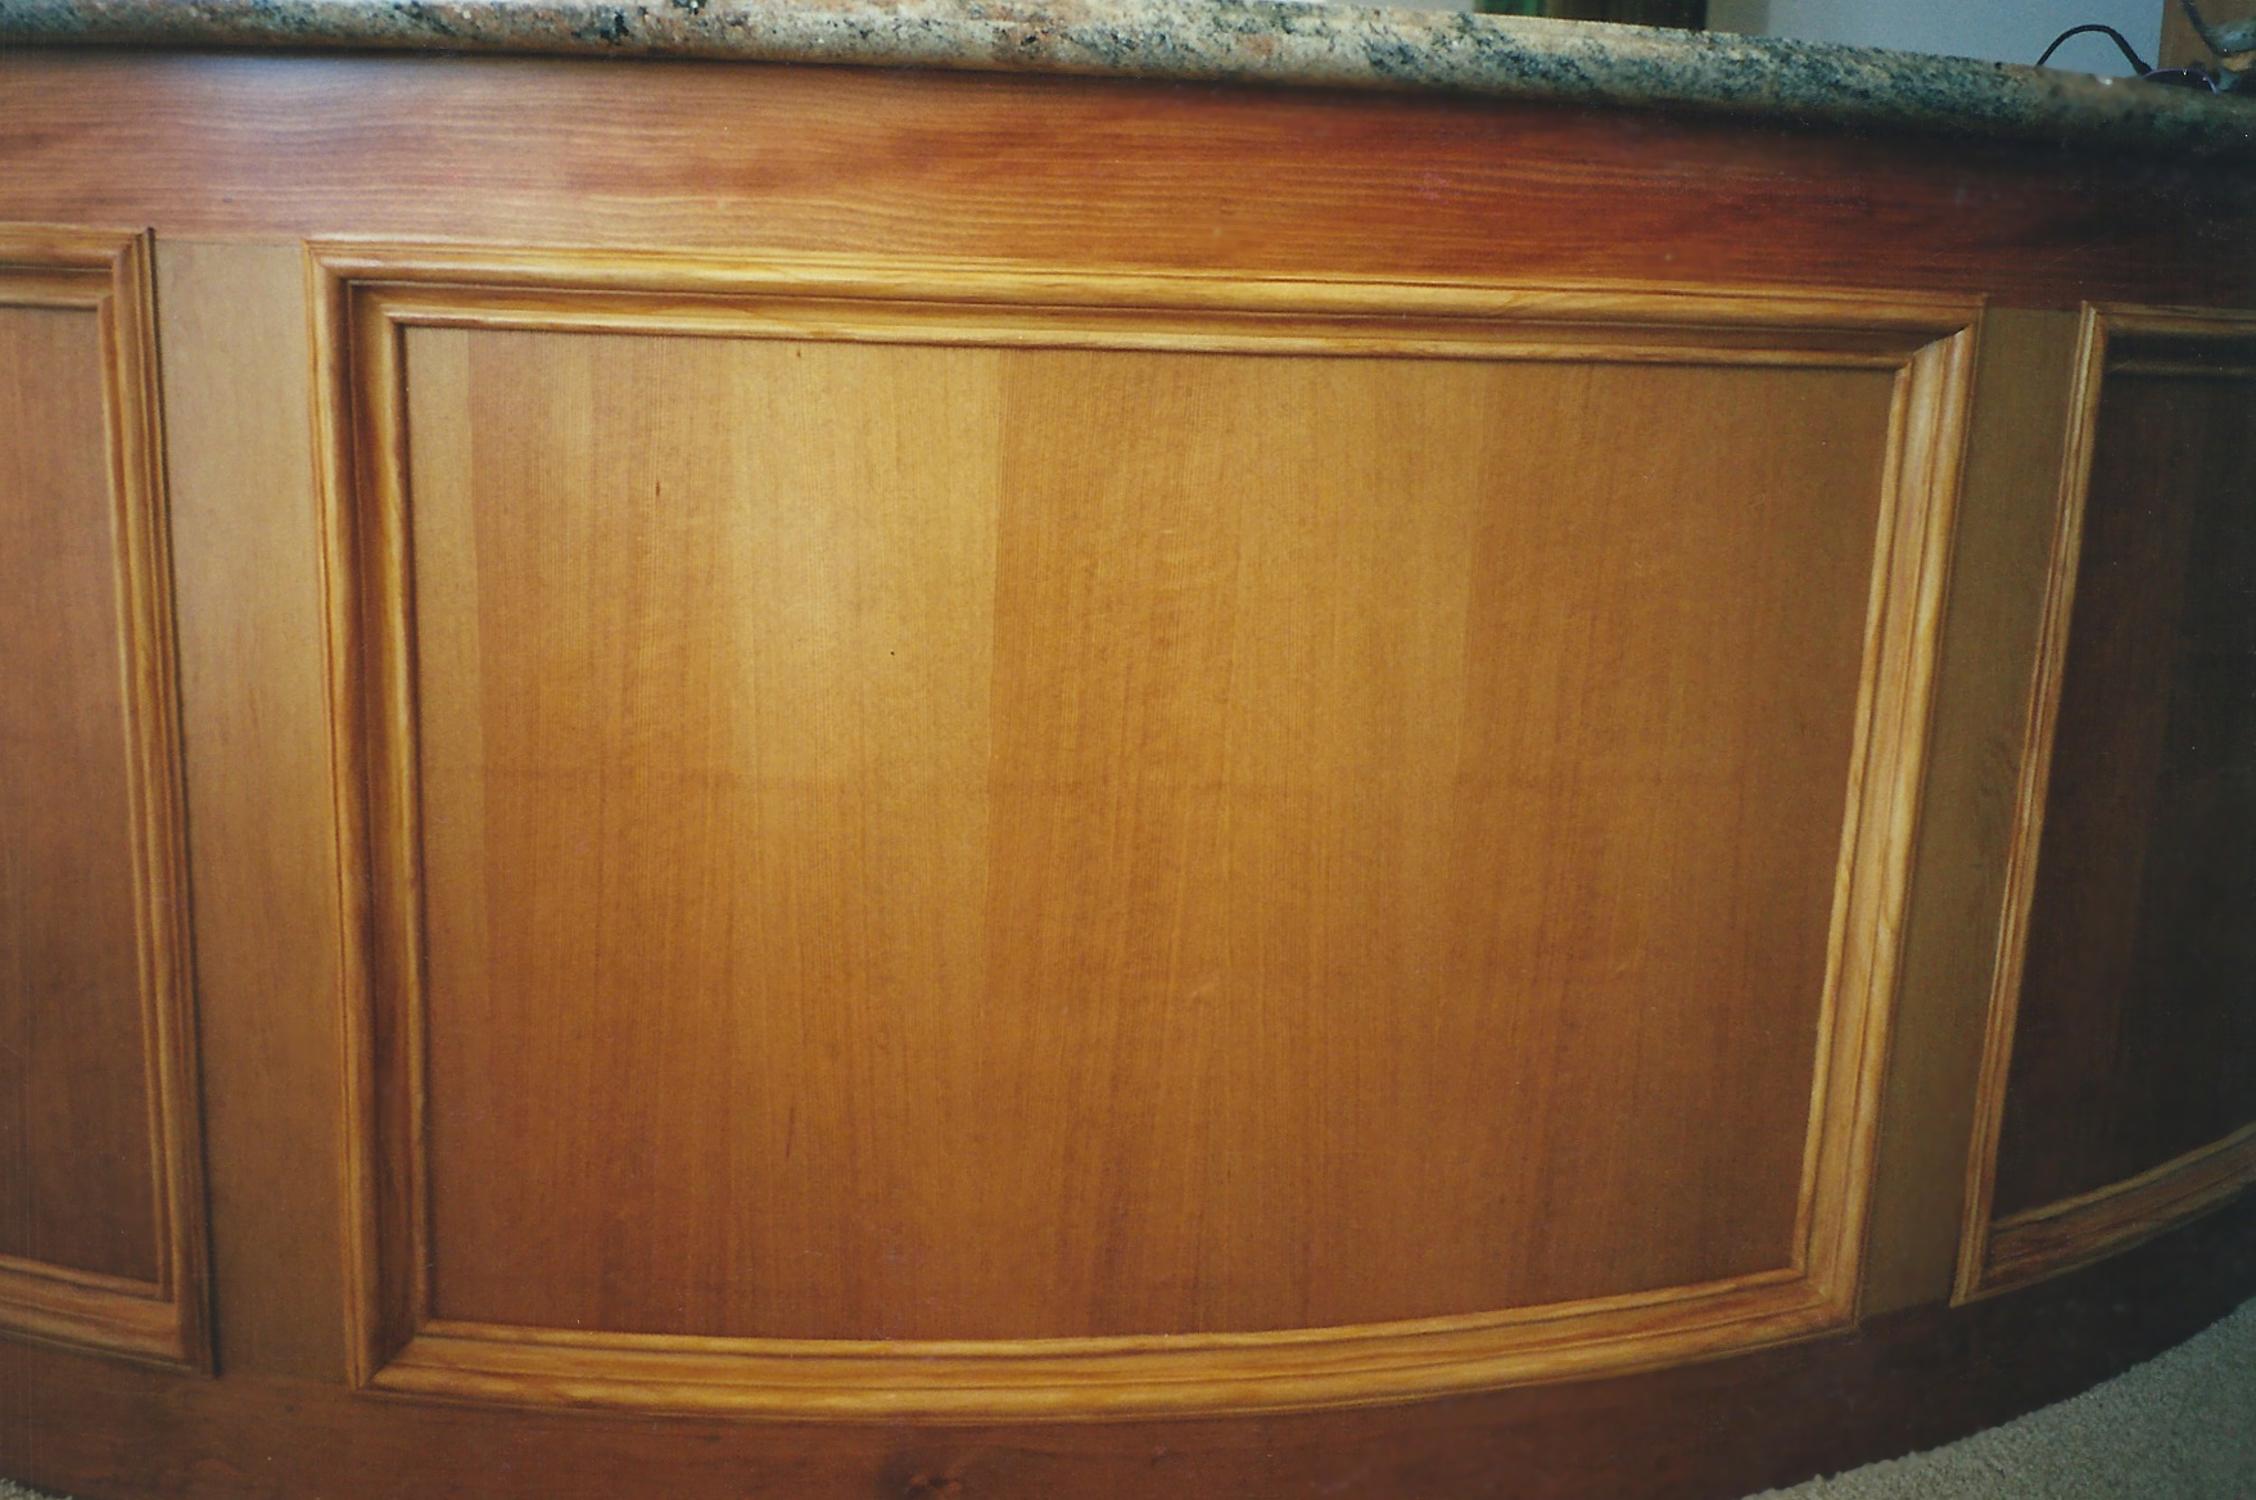 wood-grain molding